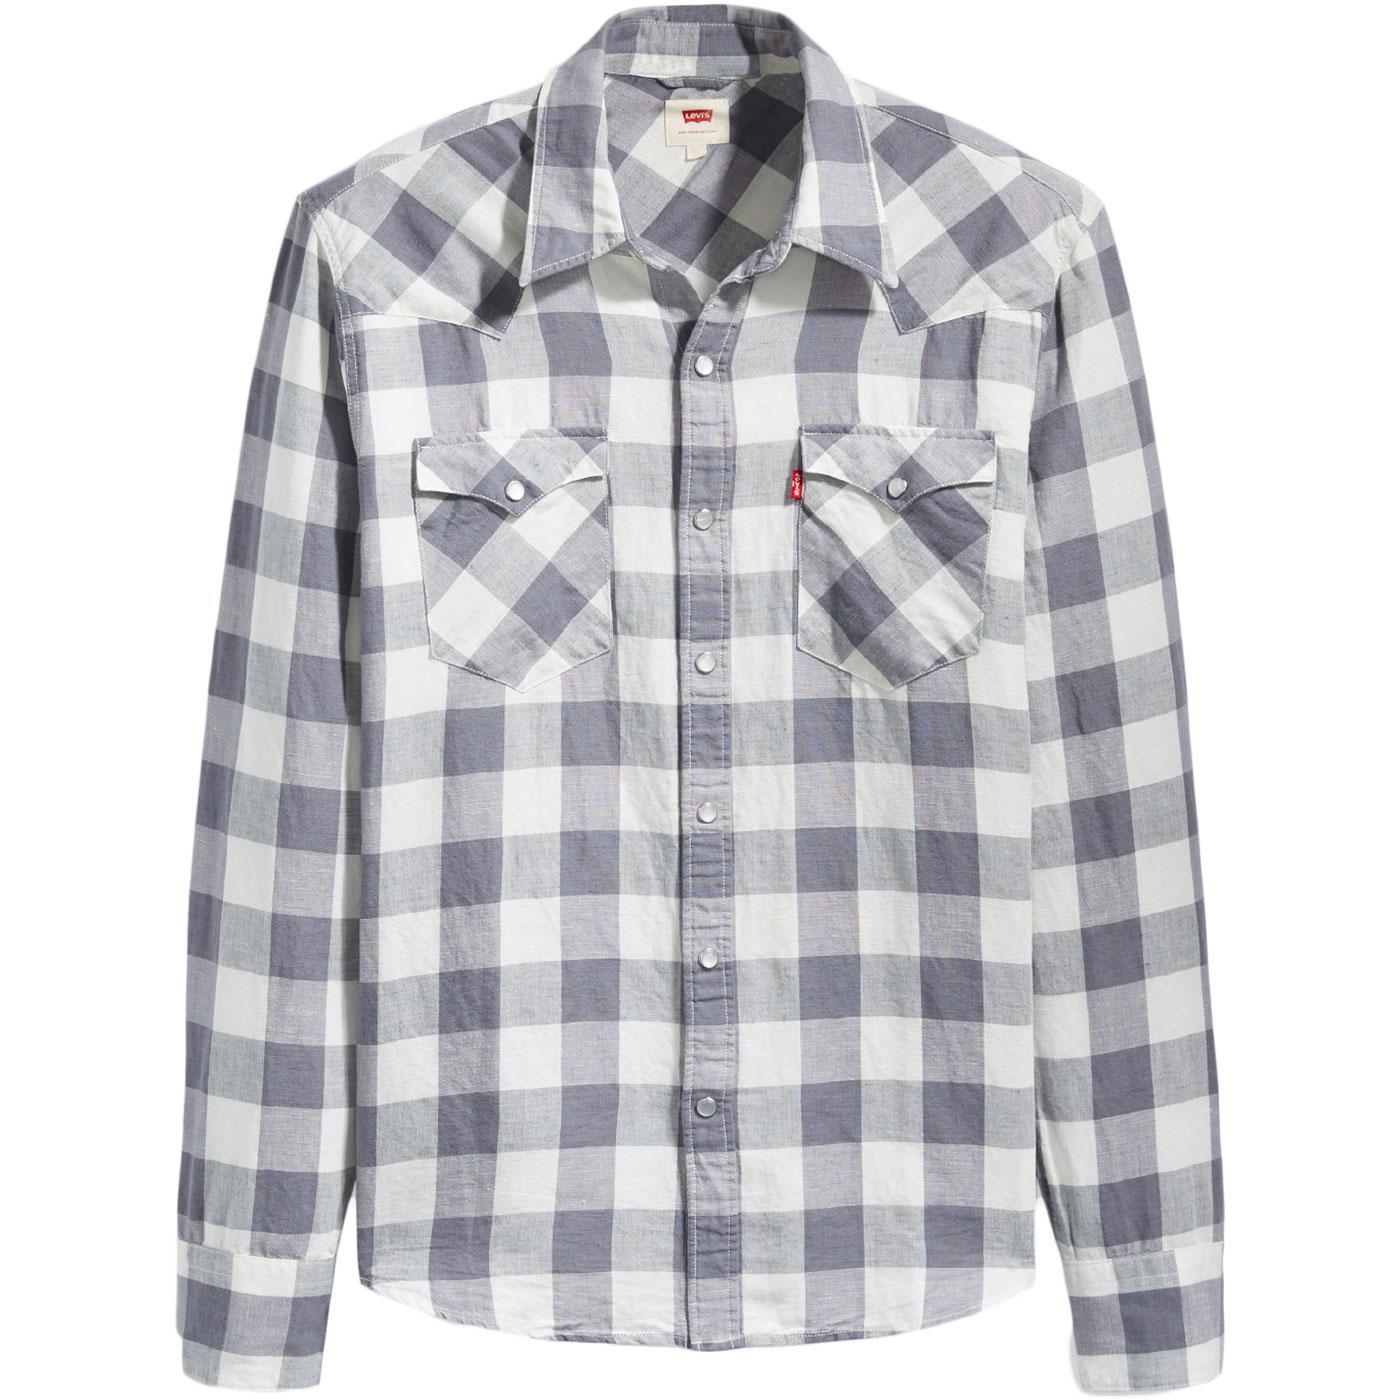 Barstow LEVI'S Retro Linen Check Western Shirt QG